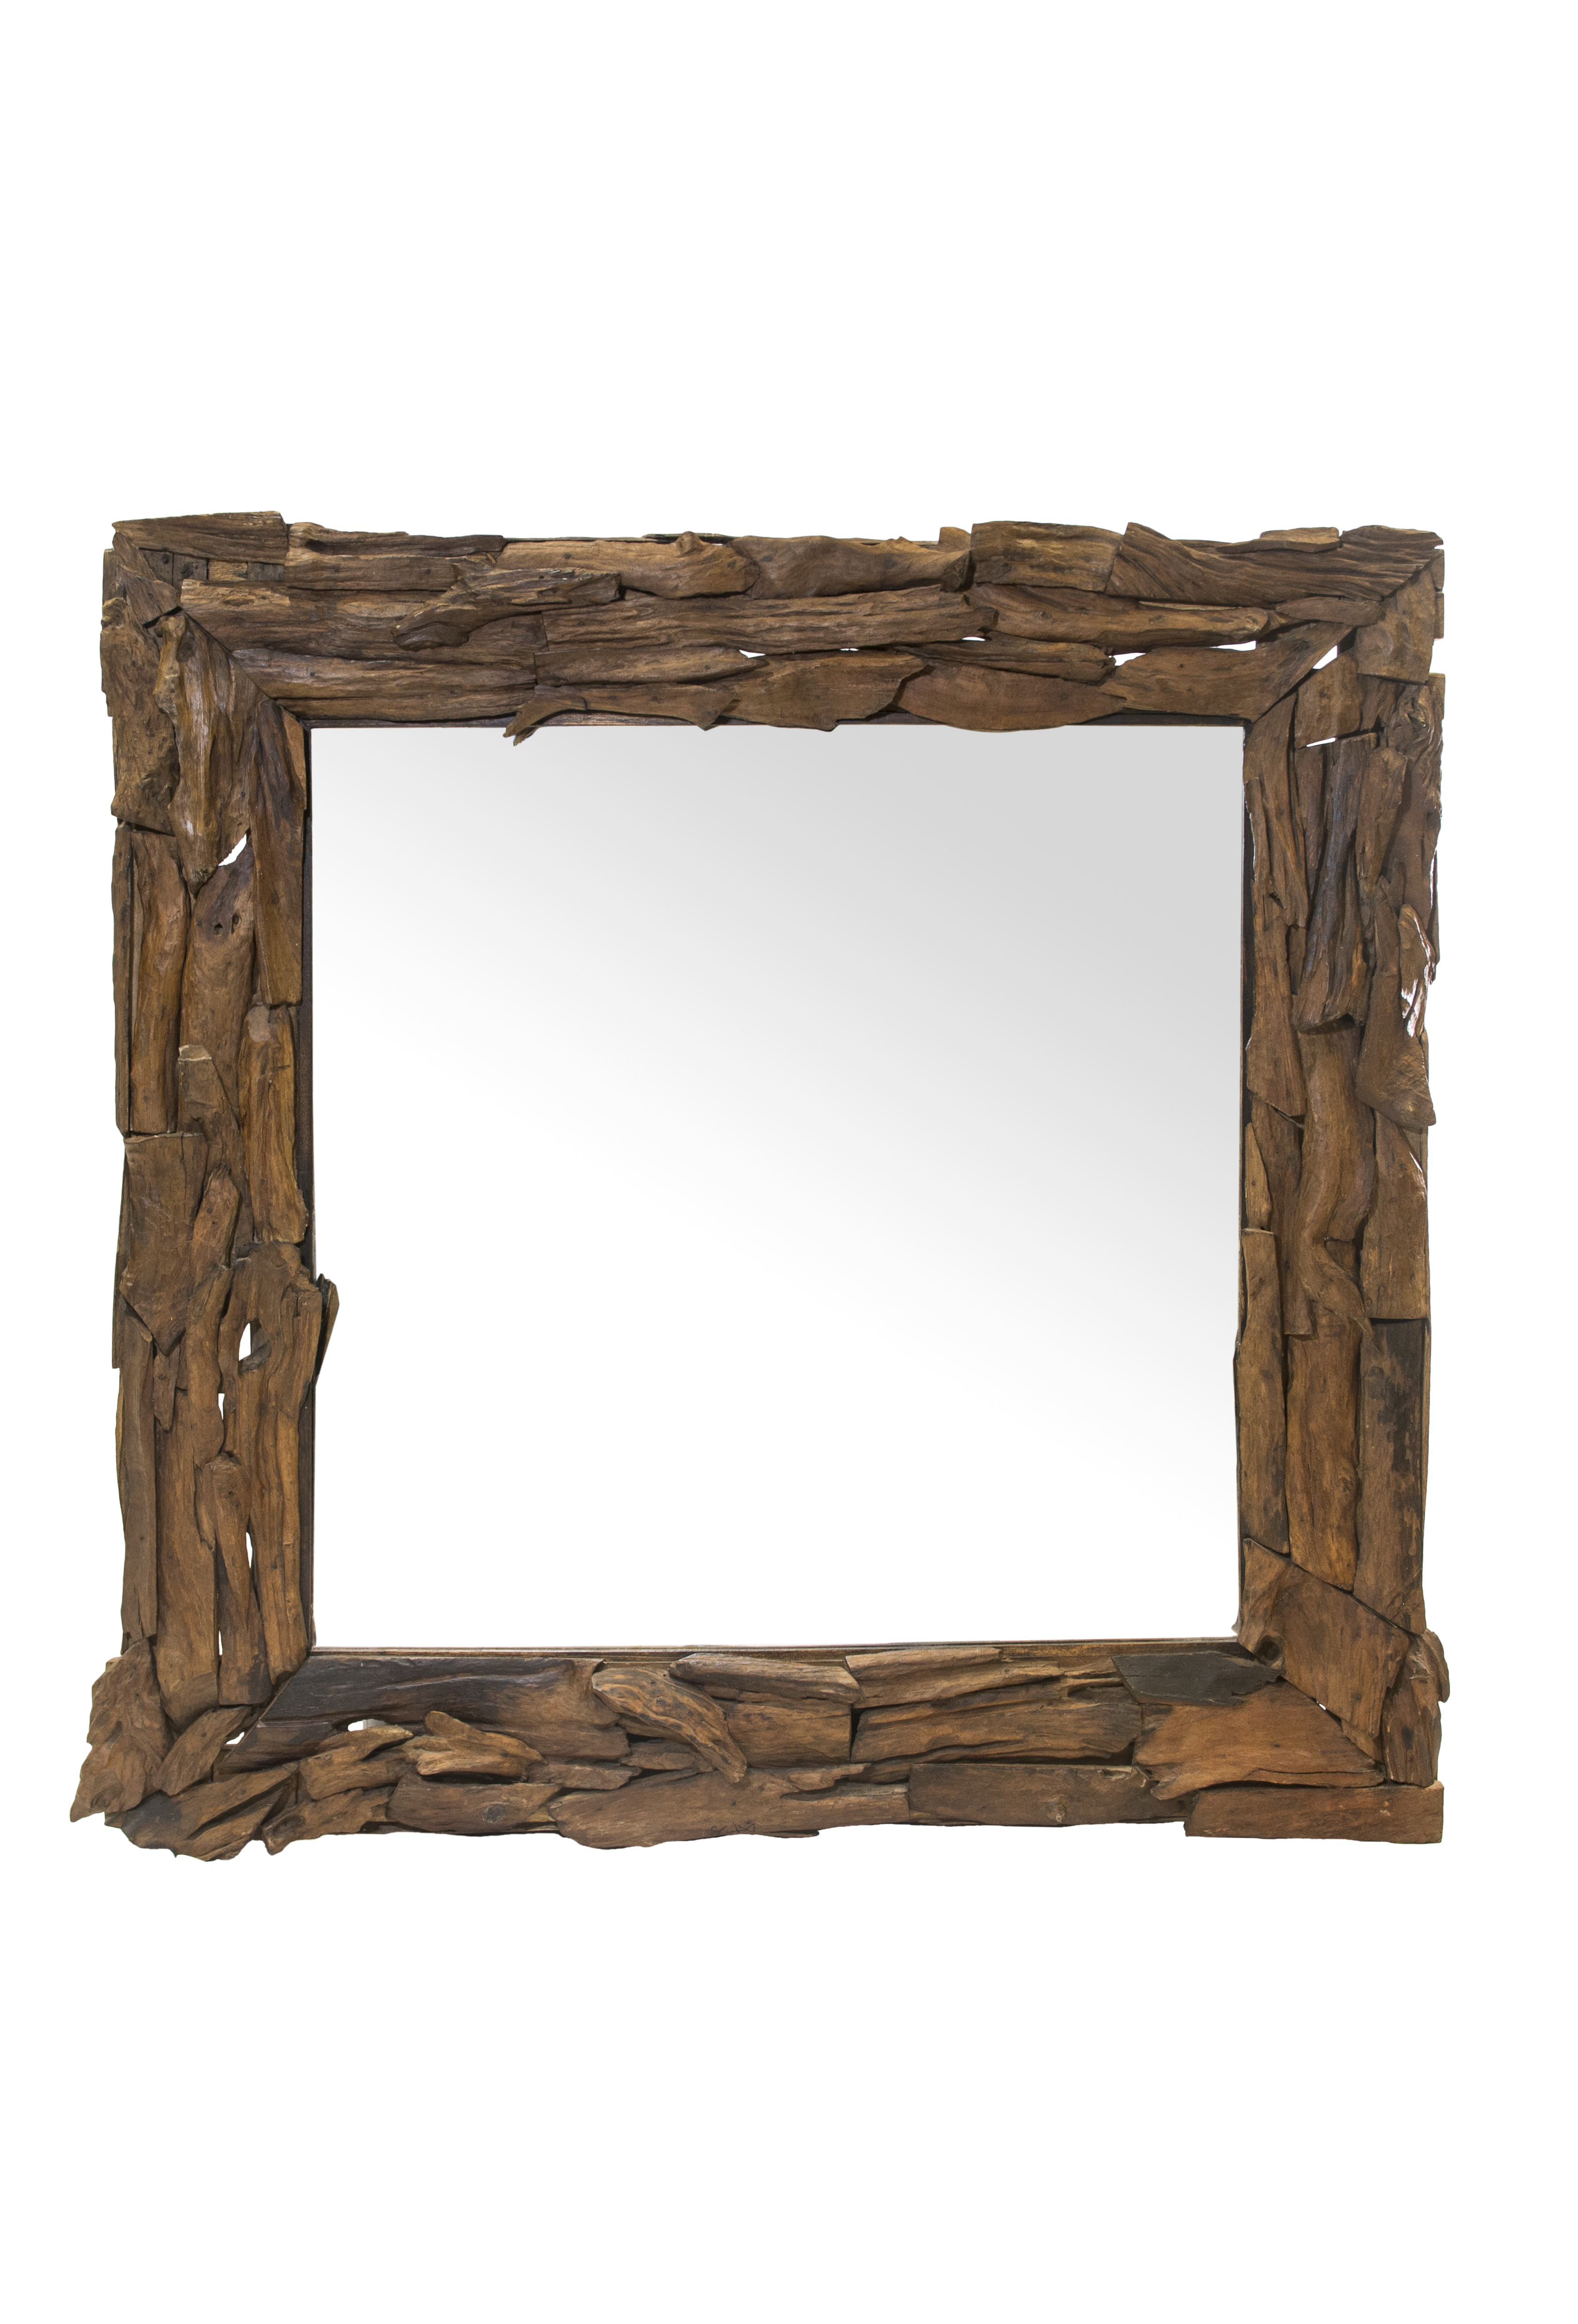 Square Teak Wooden Mirror